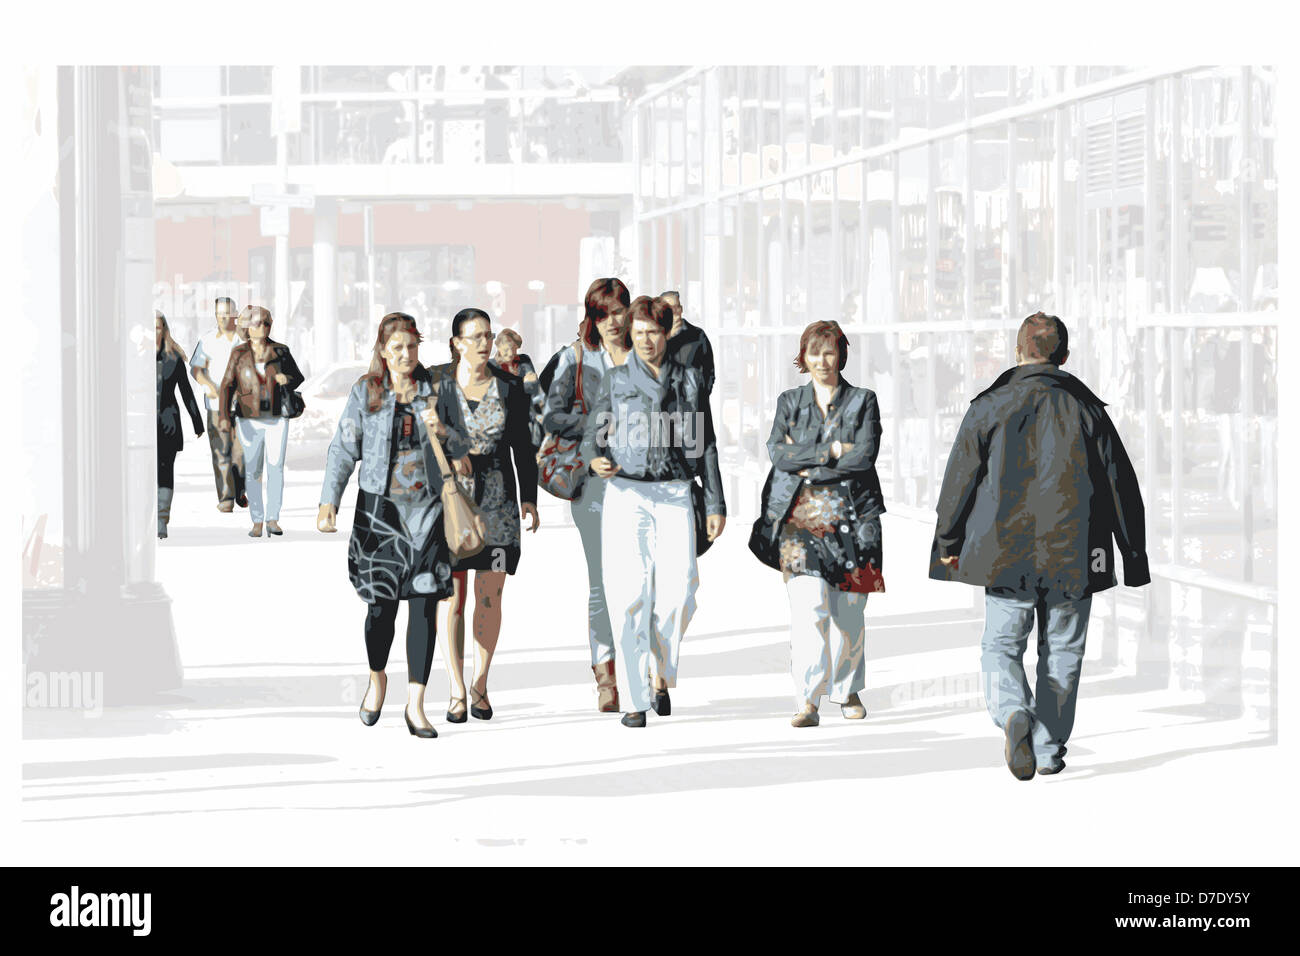 Bustling shoppers - Stock Image